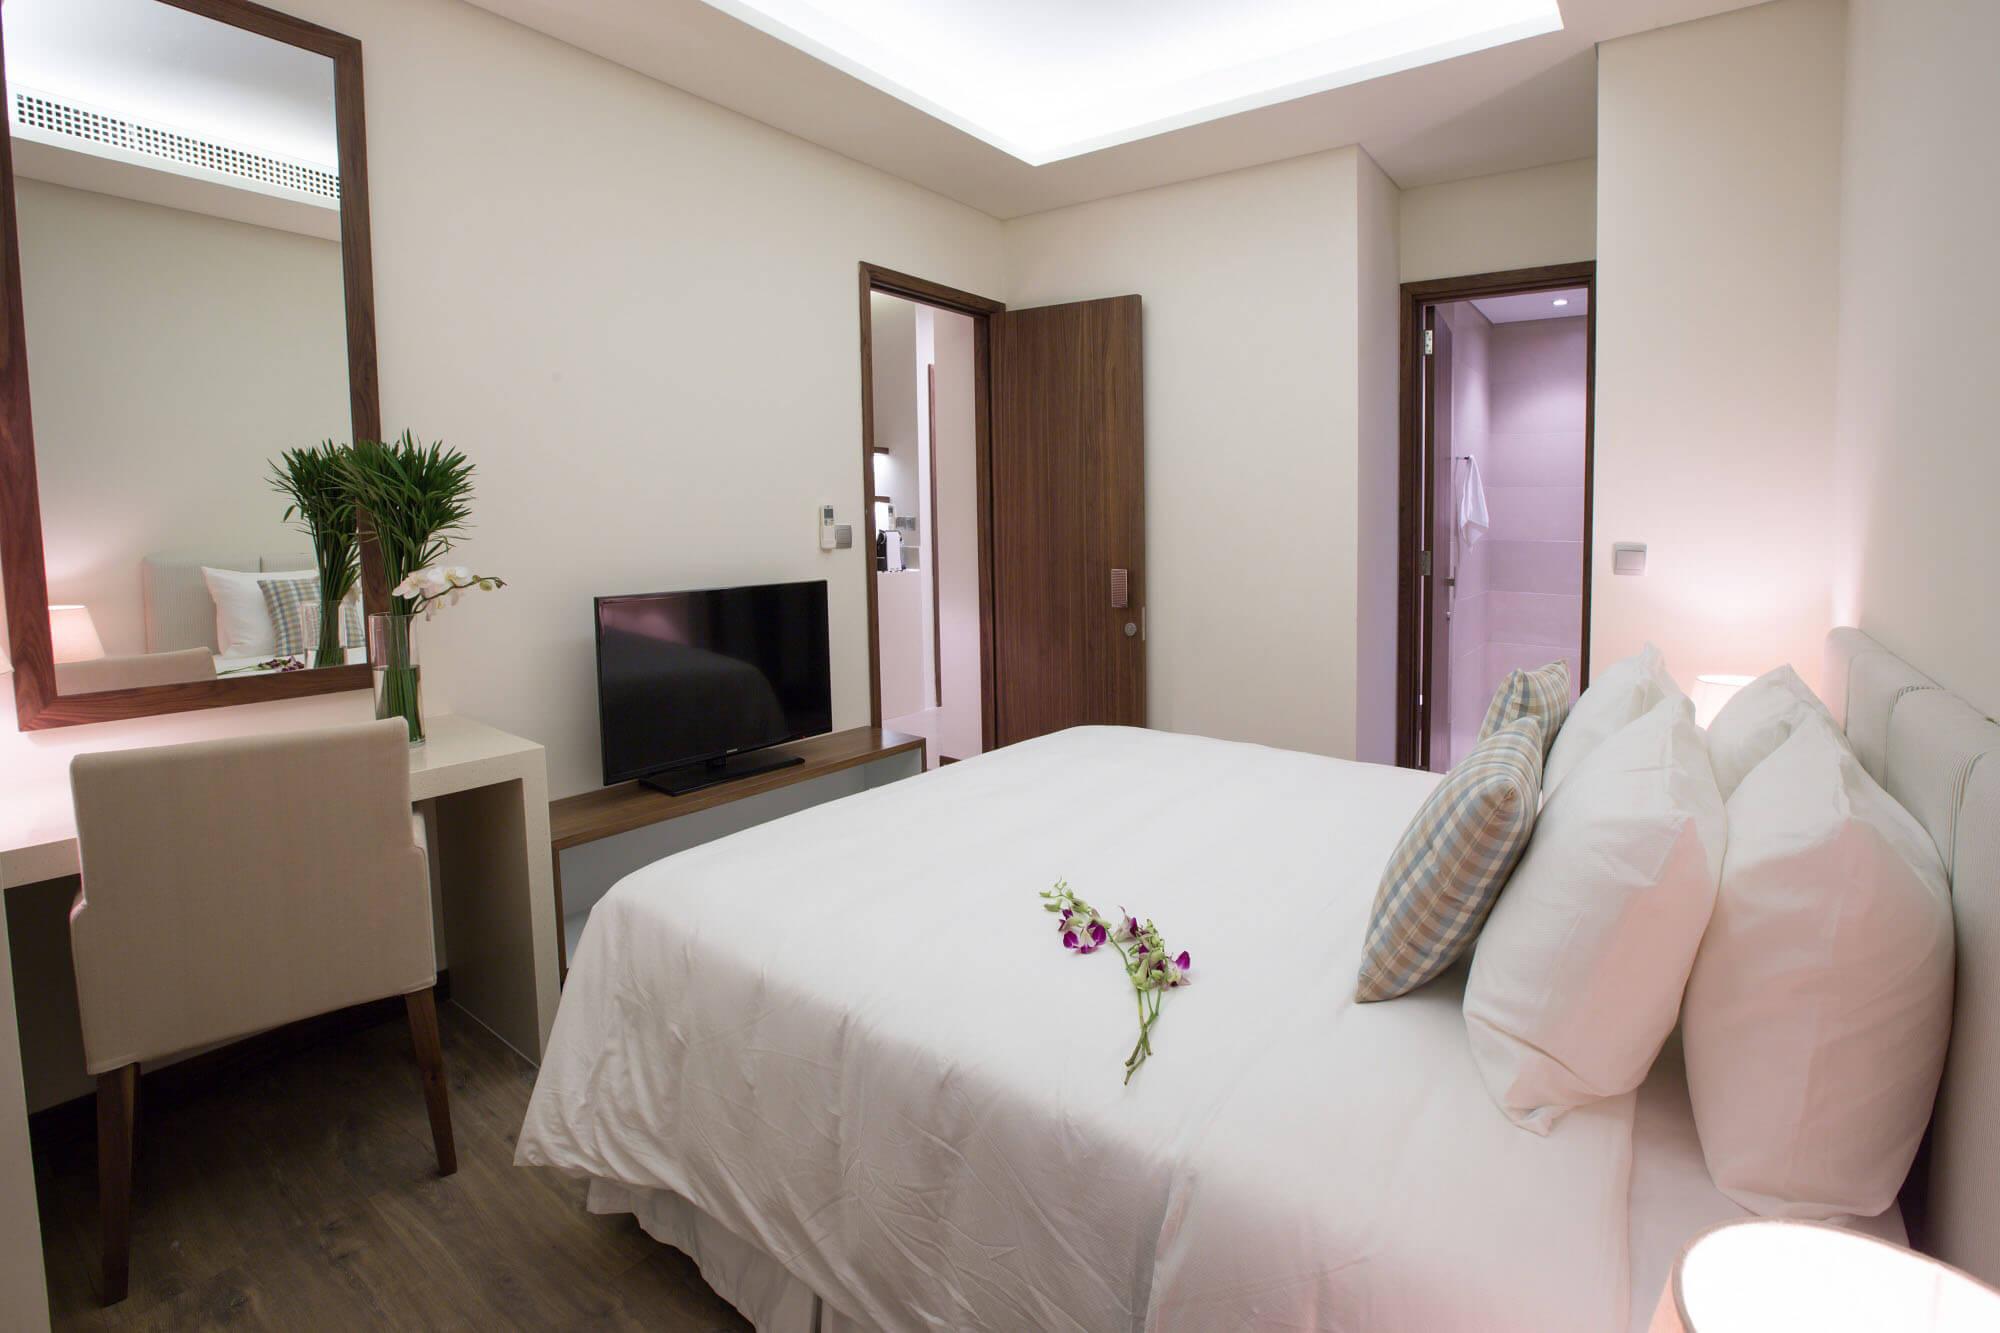 Highlight Plus Apartment Apartment A La Carte Danang Beach Hotel 200 Vo Nguyen Giap Danang Fantasticity Com 01